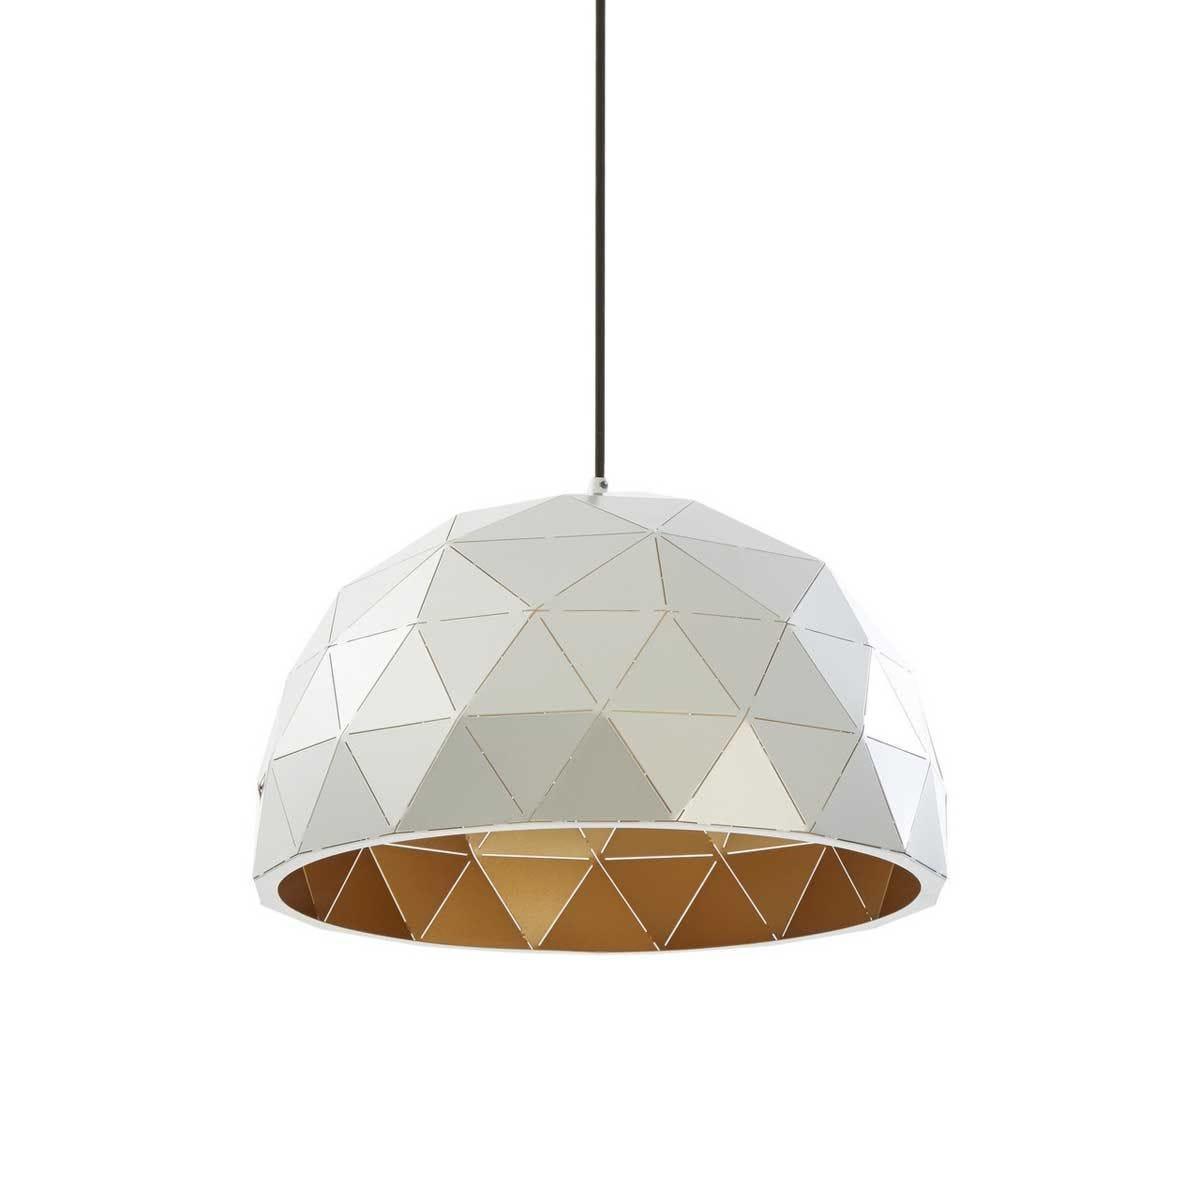 Premier Housewares Mateo Small Dome Pendant Light - Silver